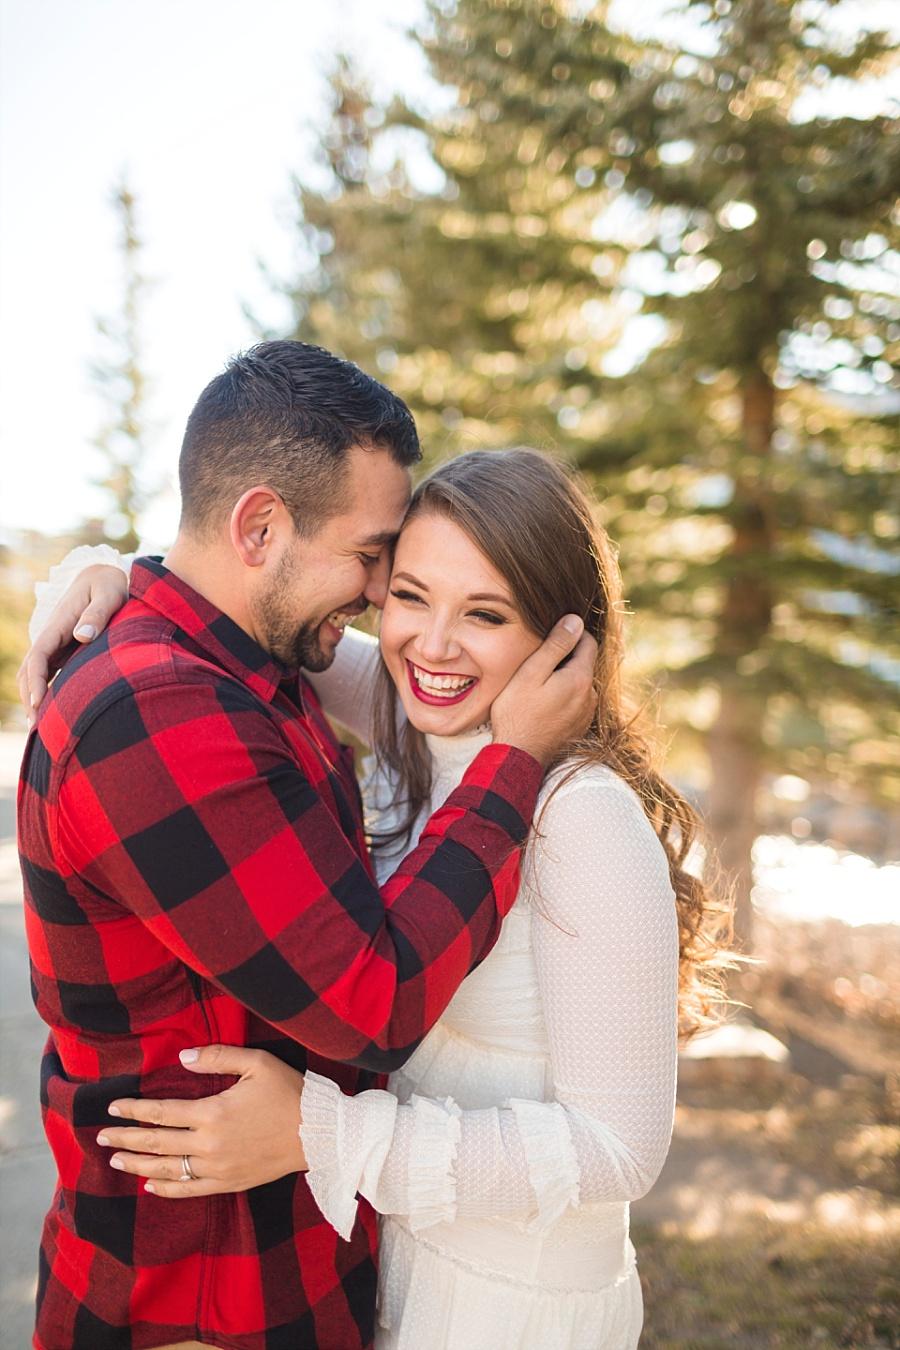 Stacy Anderson Photography Breckenridge Denver Boulder Vail Colorado Travel Lifestyle Elopement Vow renewal Family Wedding Photographer_0004.jpg